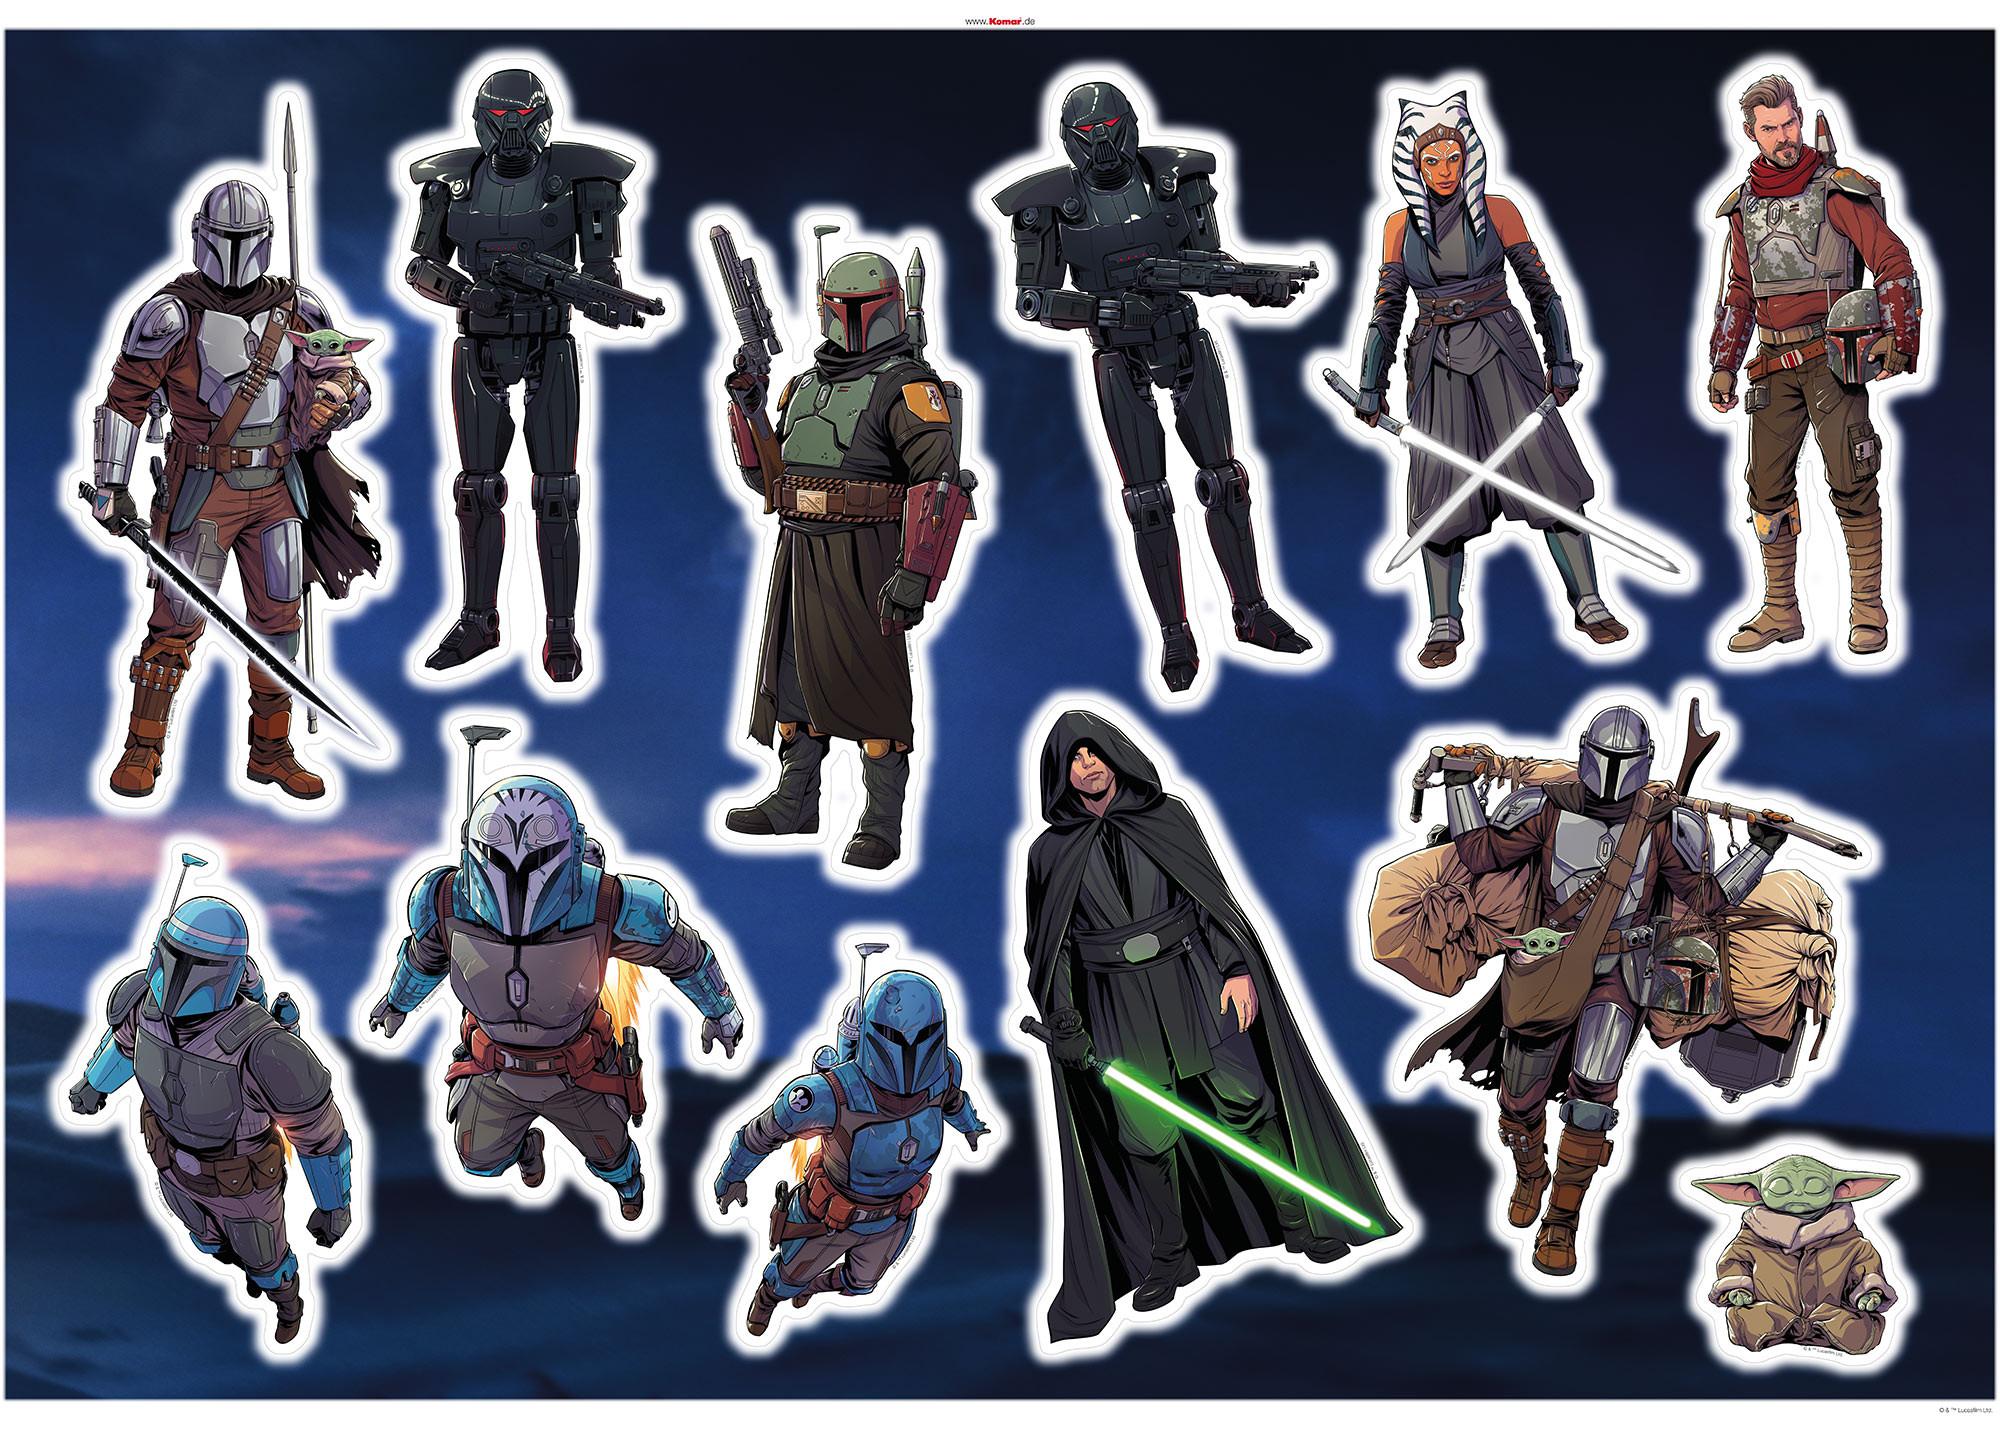 Mandalorian Iconic Figures